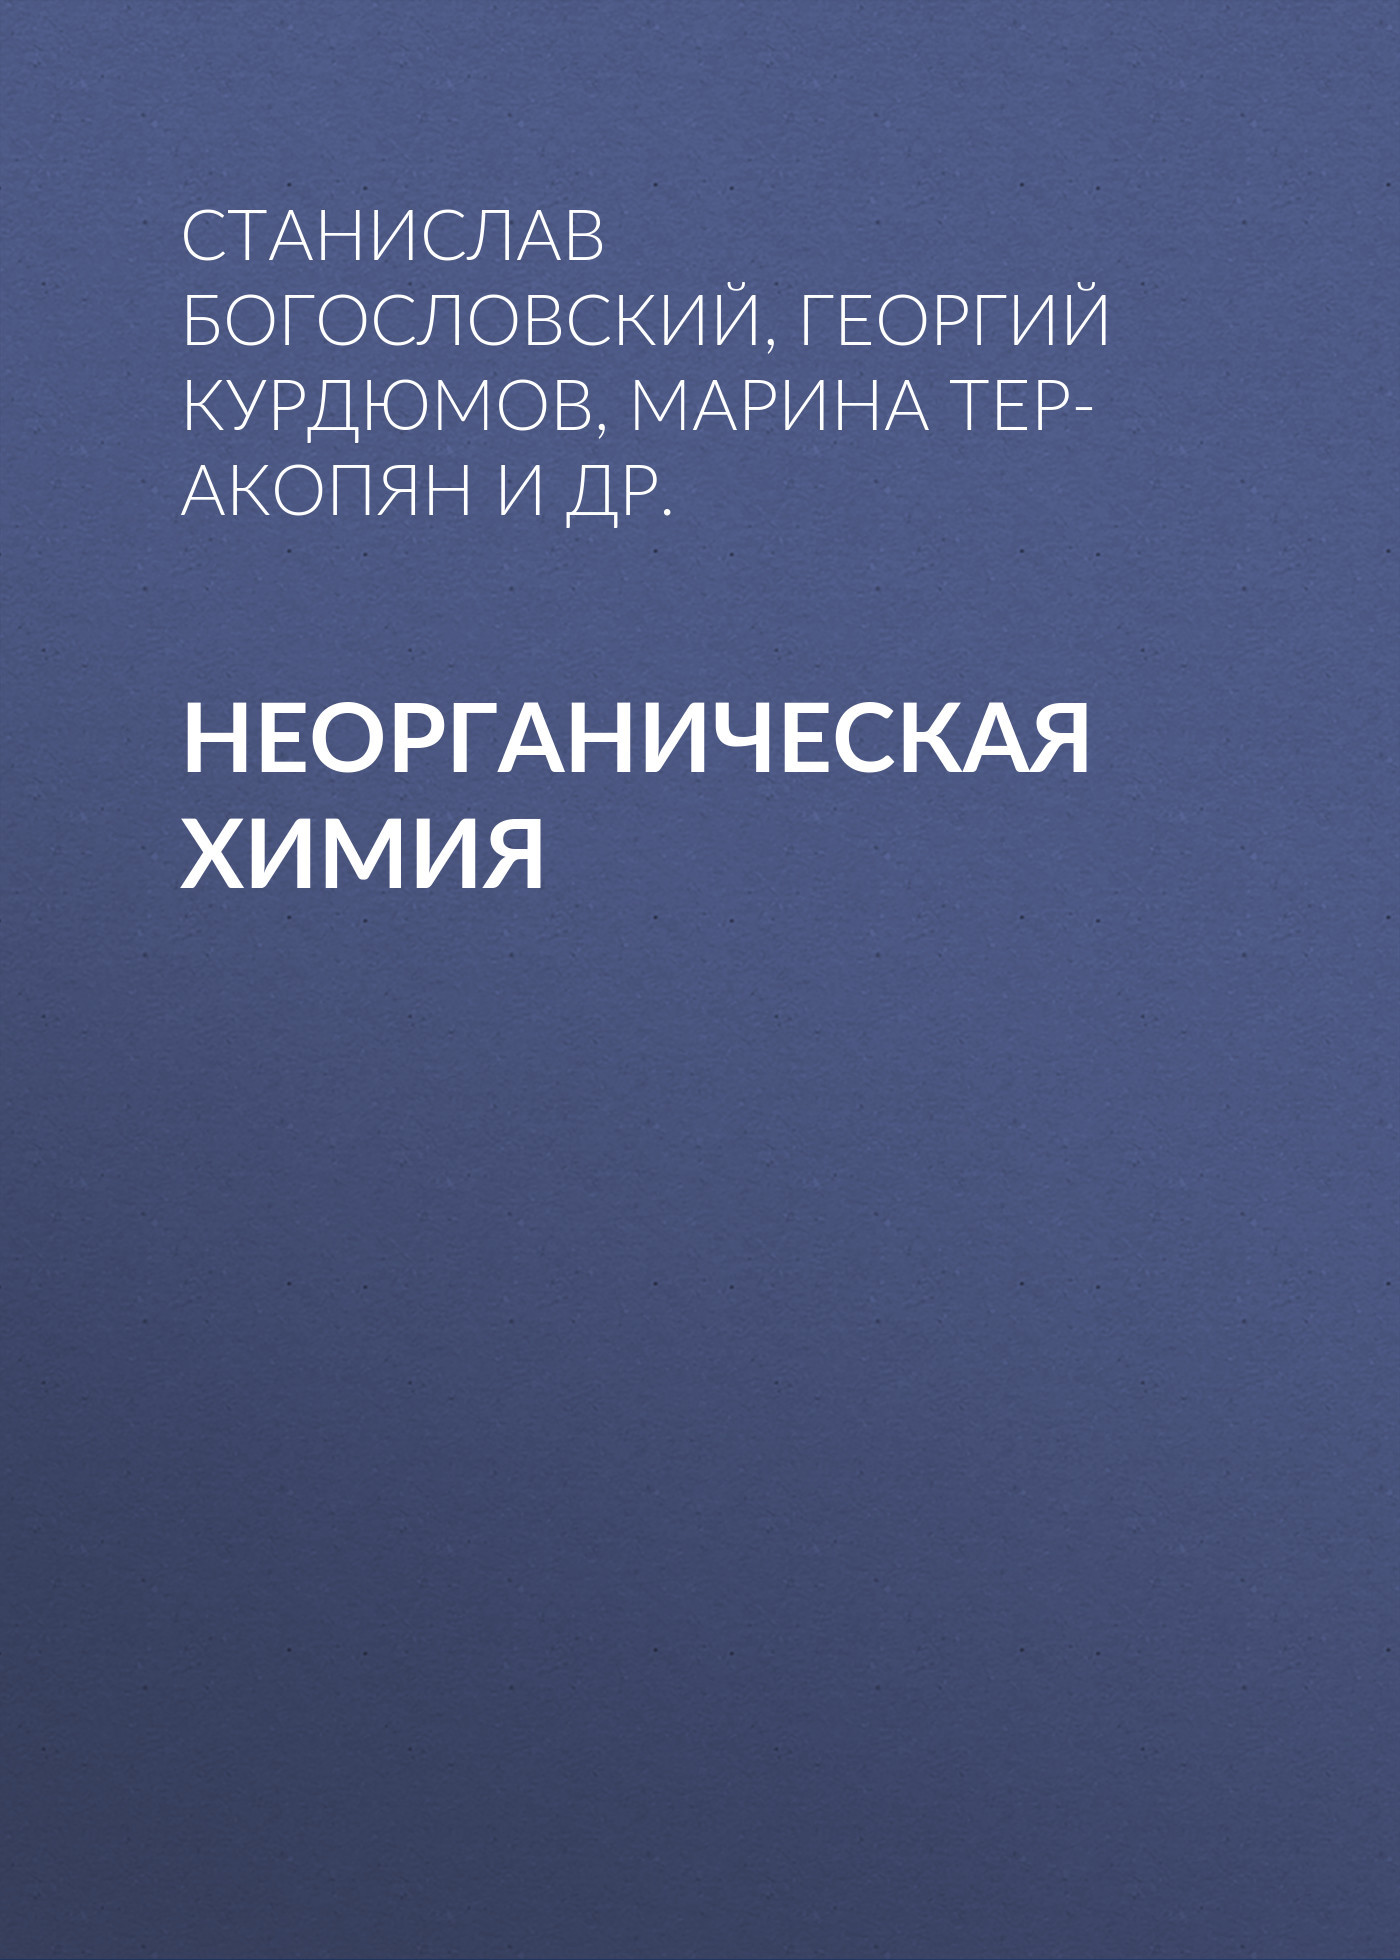 Марина Тер-Акопян Неорганическая химия тер акопян а контактеры дней апокалипсиса isbn 5860710011